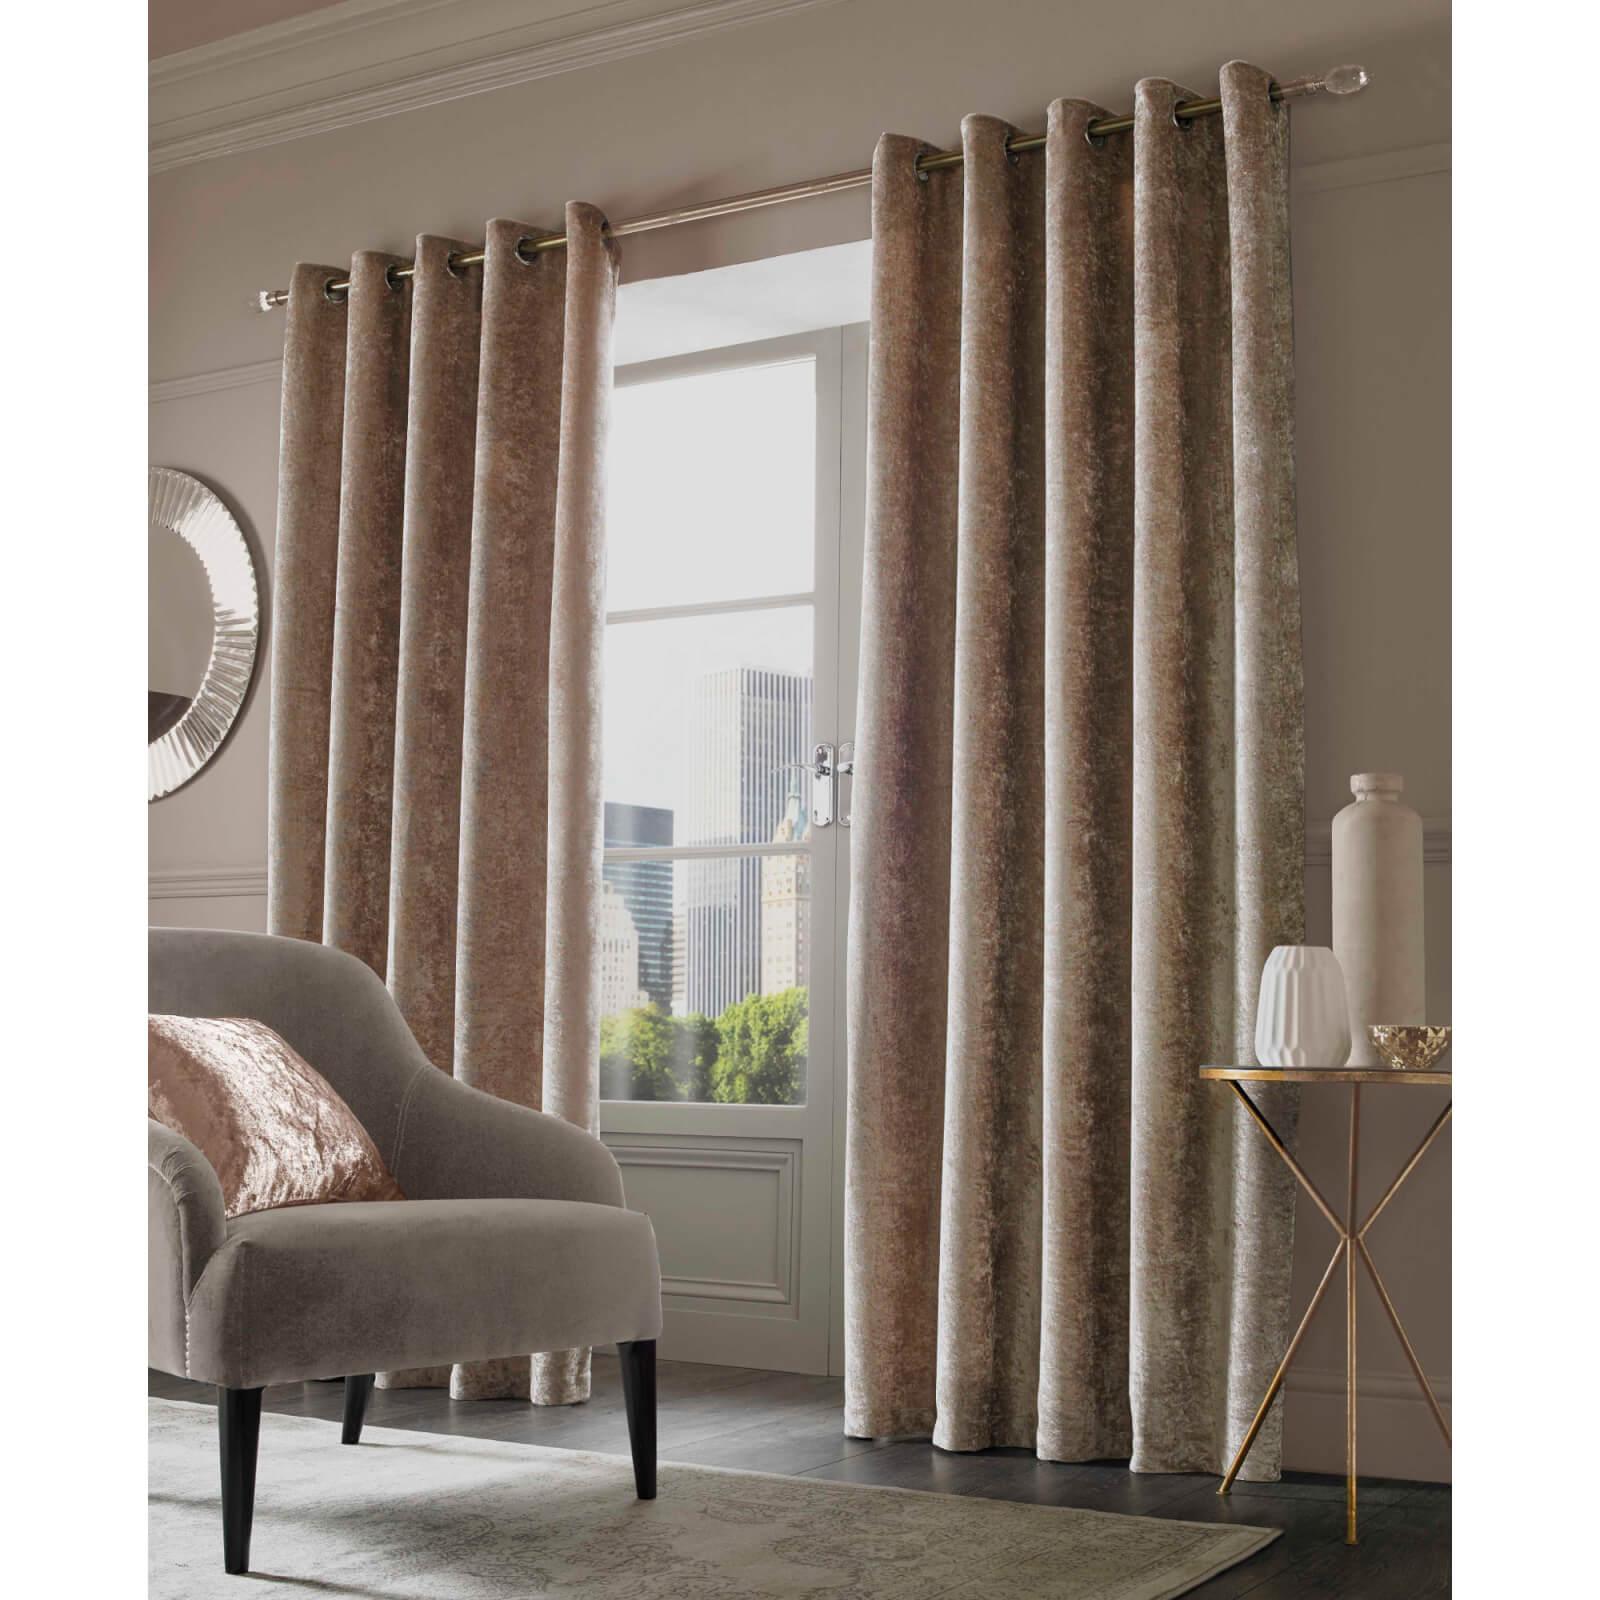 Sienna Eyelet Crushed Velvet Curtains Natural Homeware Zavvi Us